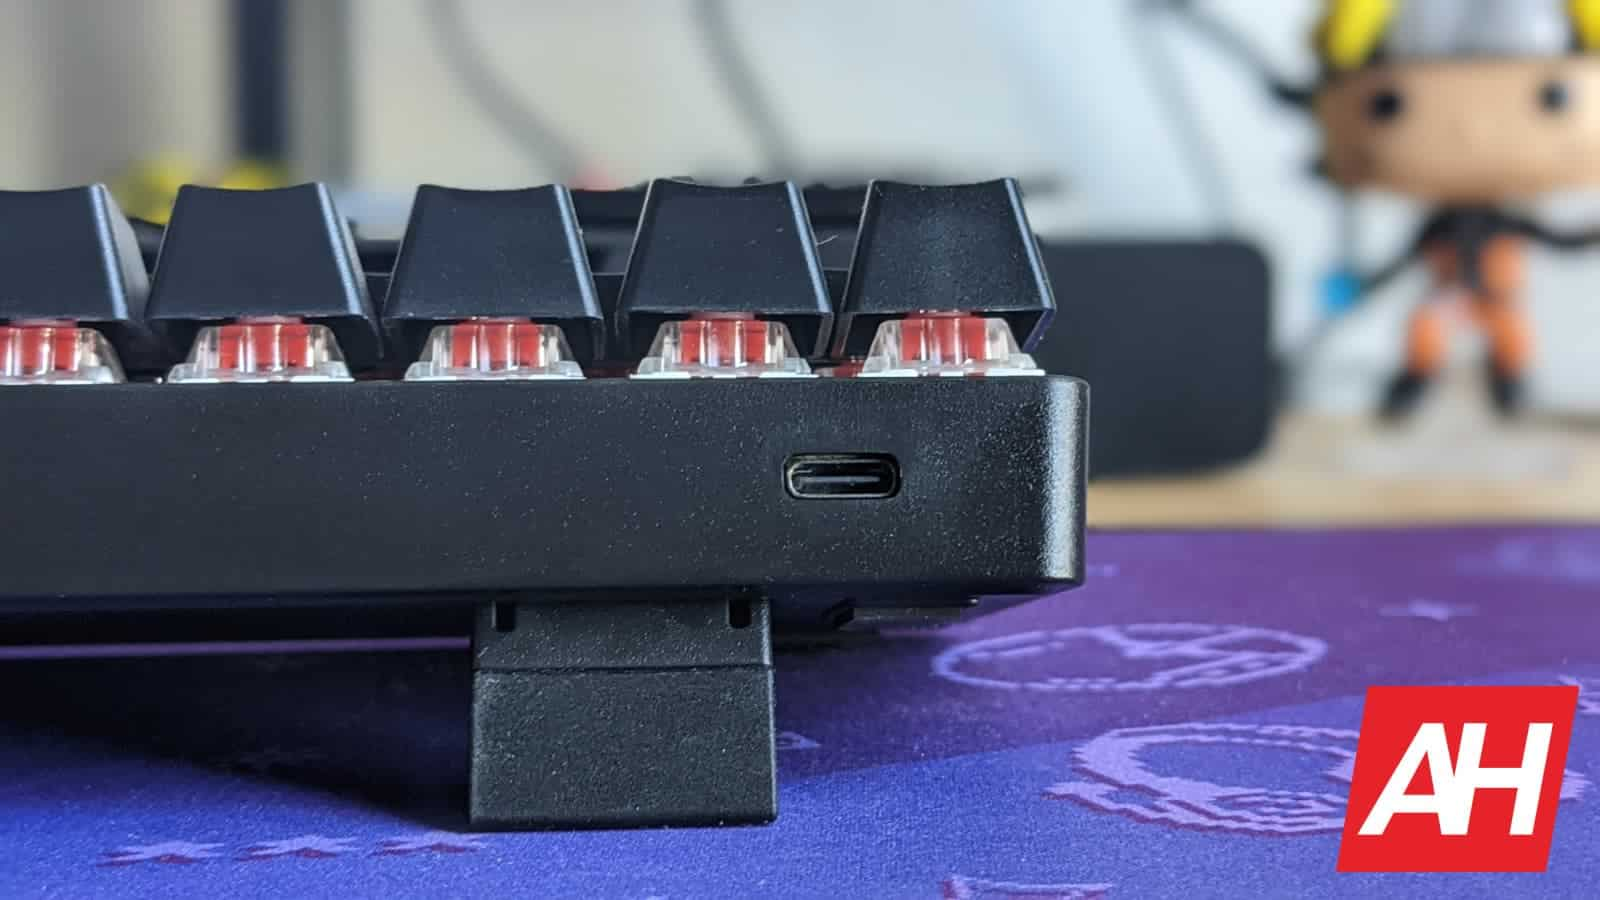 WhirlwindFX Atom 60 Gaming Keyboard Review 5